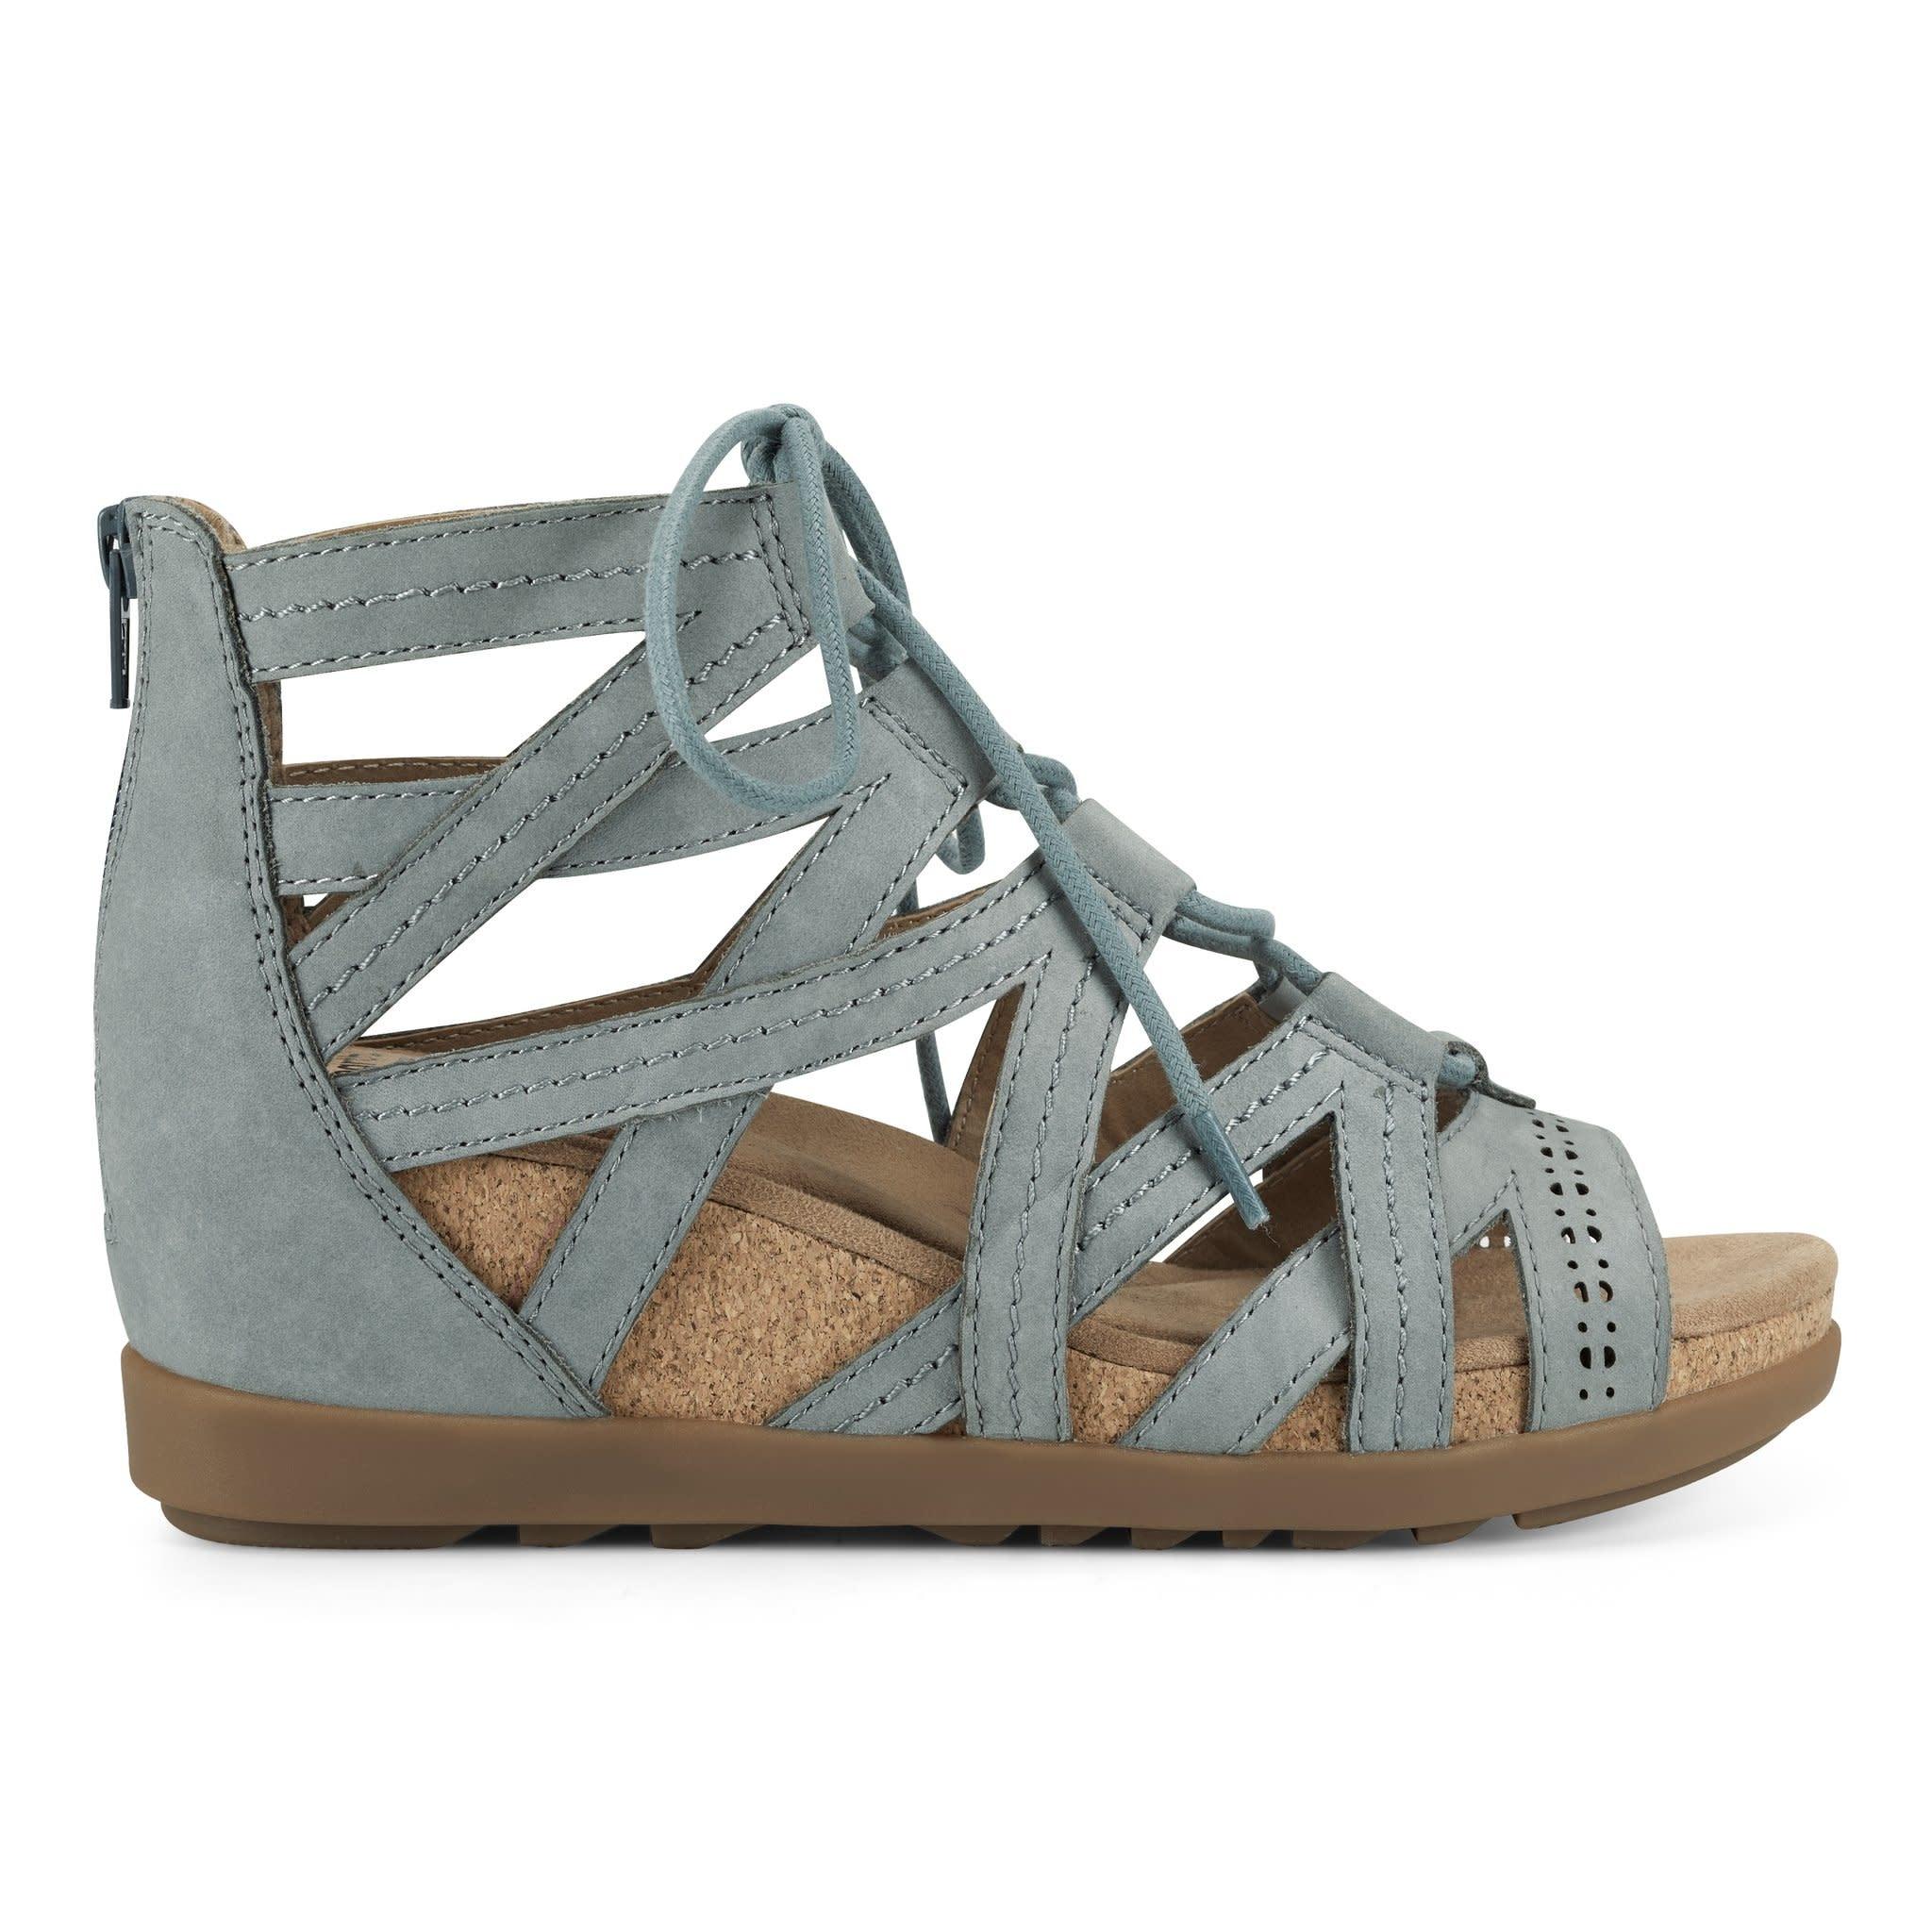 Corie Pearl Gladiator Sandal